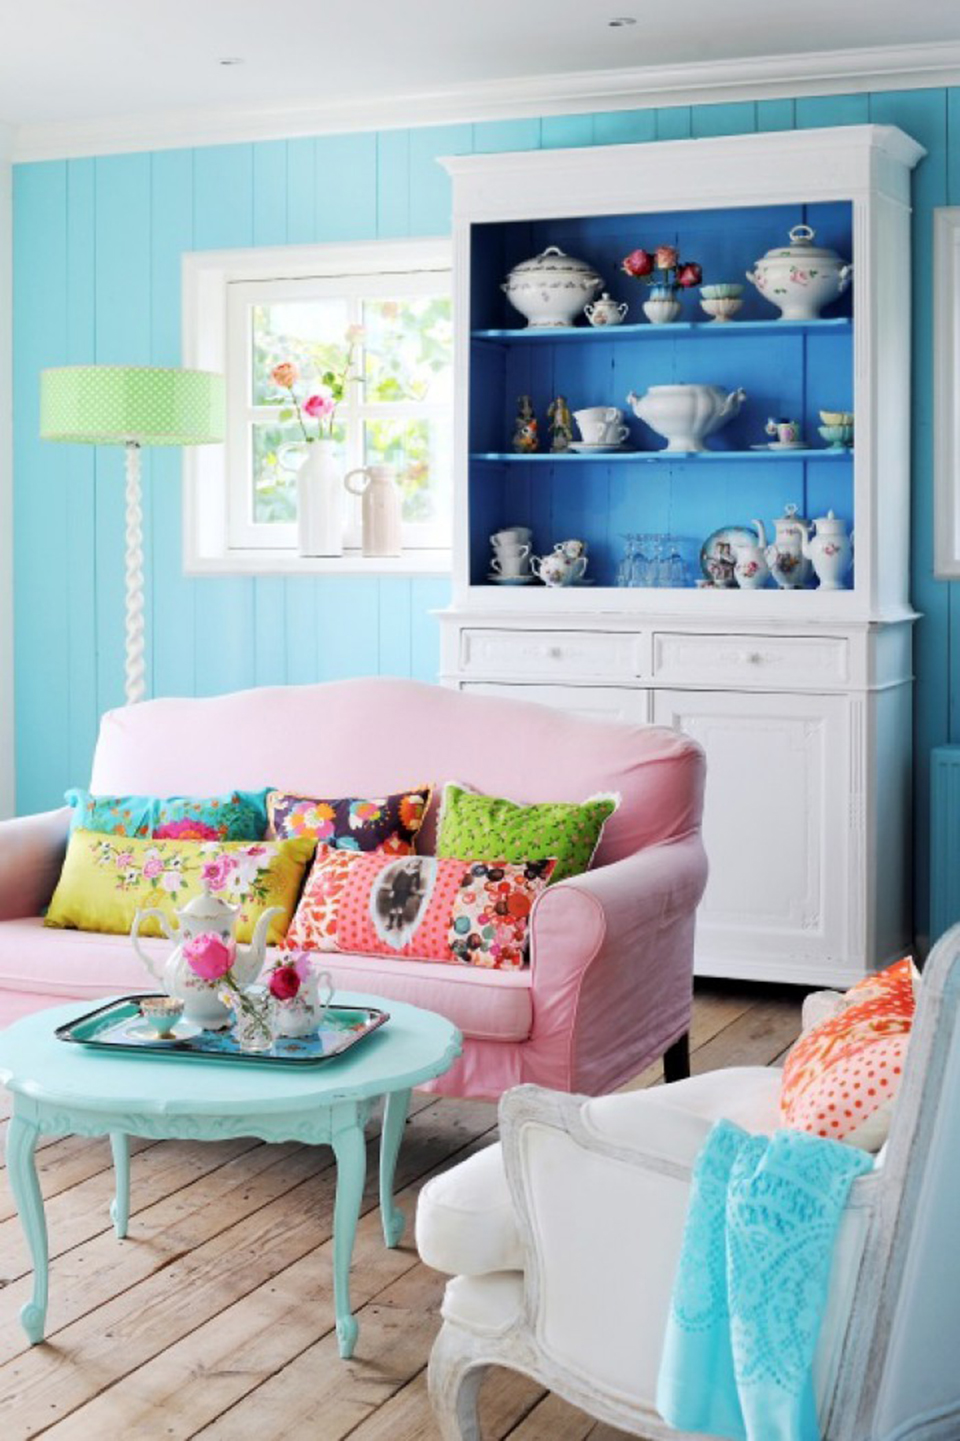 50 Small Living Room Ideas thewowdecor (31)